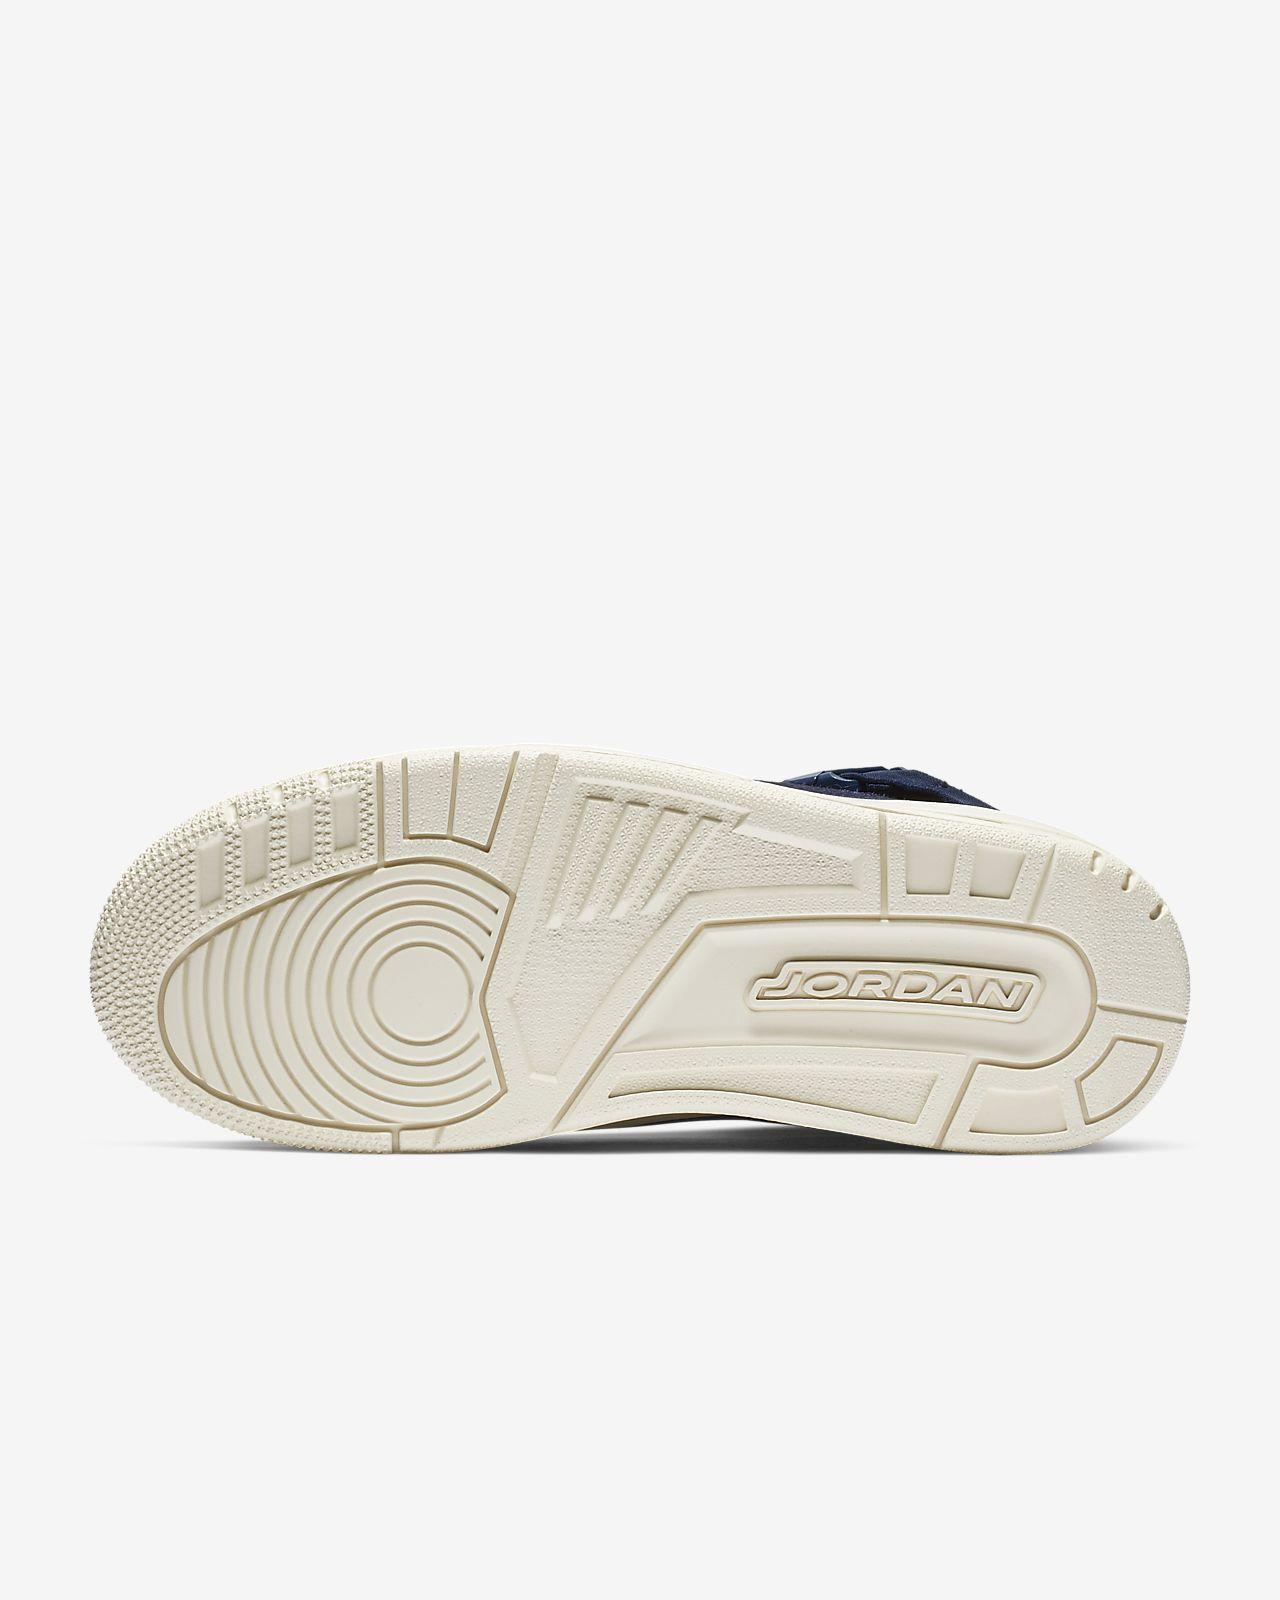 new styles fb5a6 07f2d Chaussure Air Jordan 3 Retro Explorer XX pour Femme. Nike.com FR